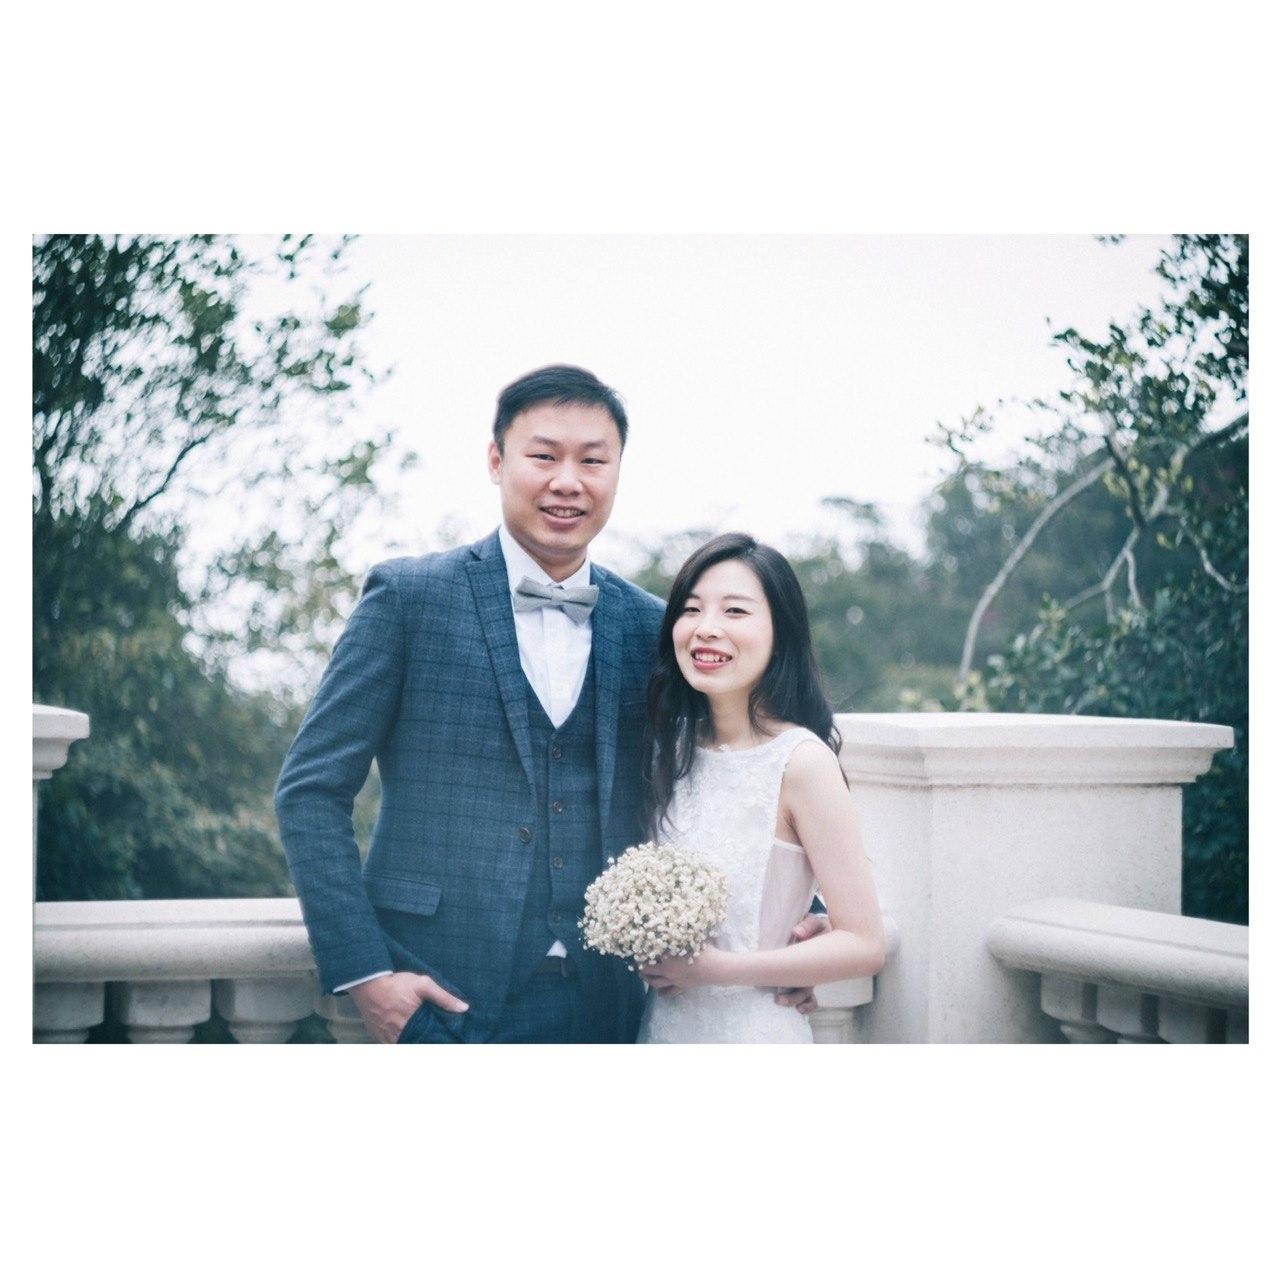 Photograph,Facial expression,Snapshot,Ceremony,Wedding dress